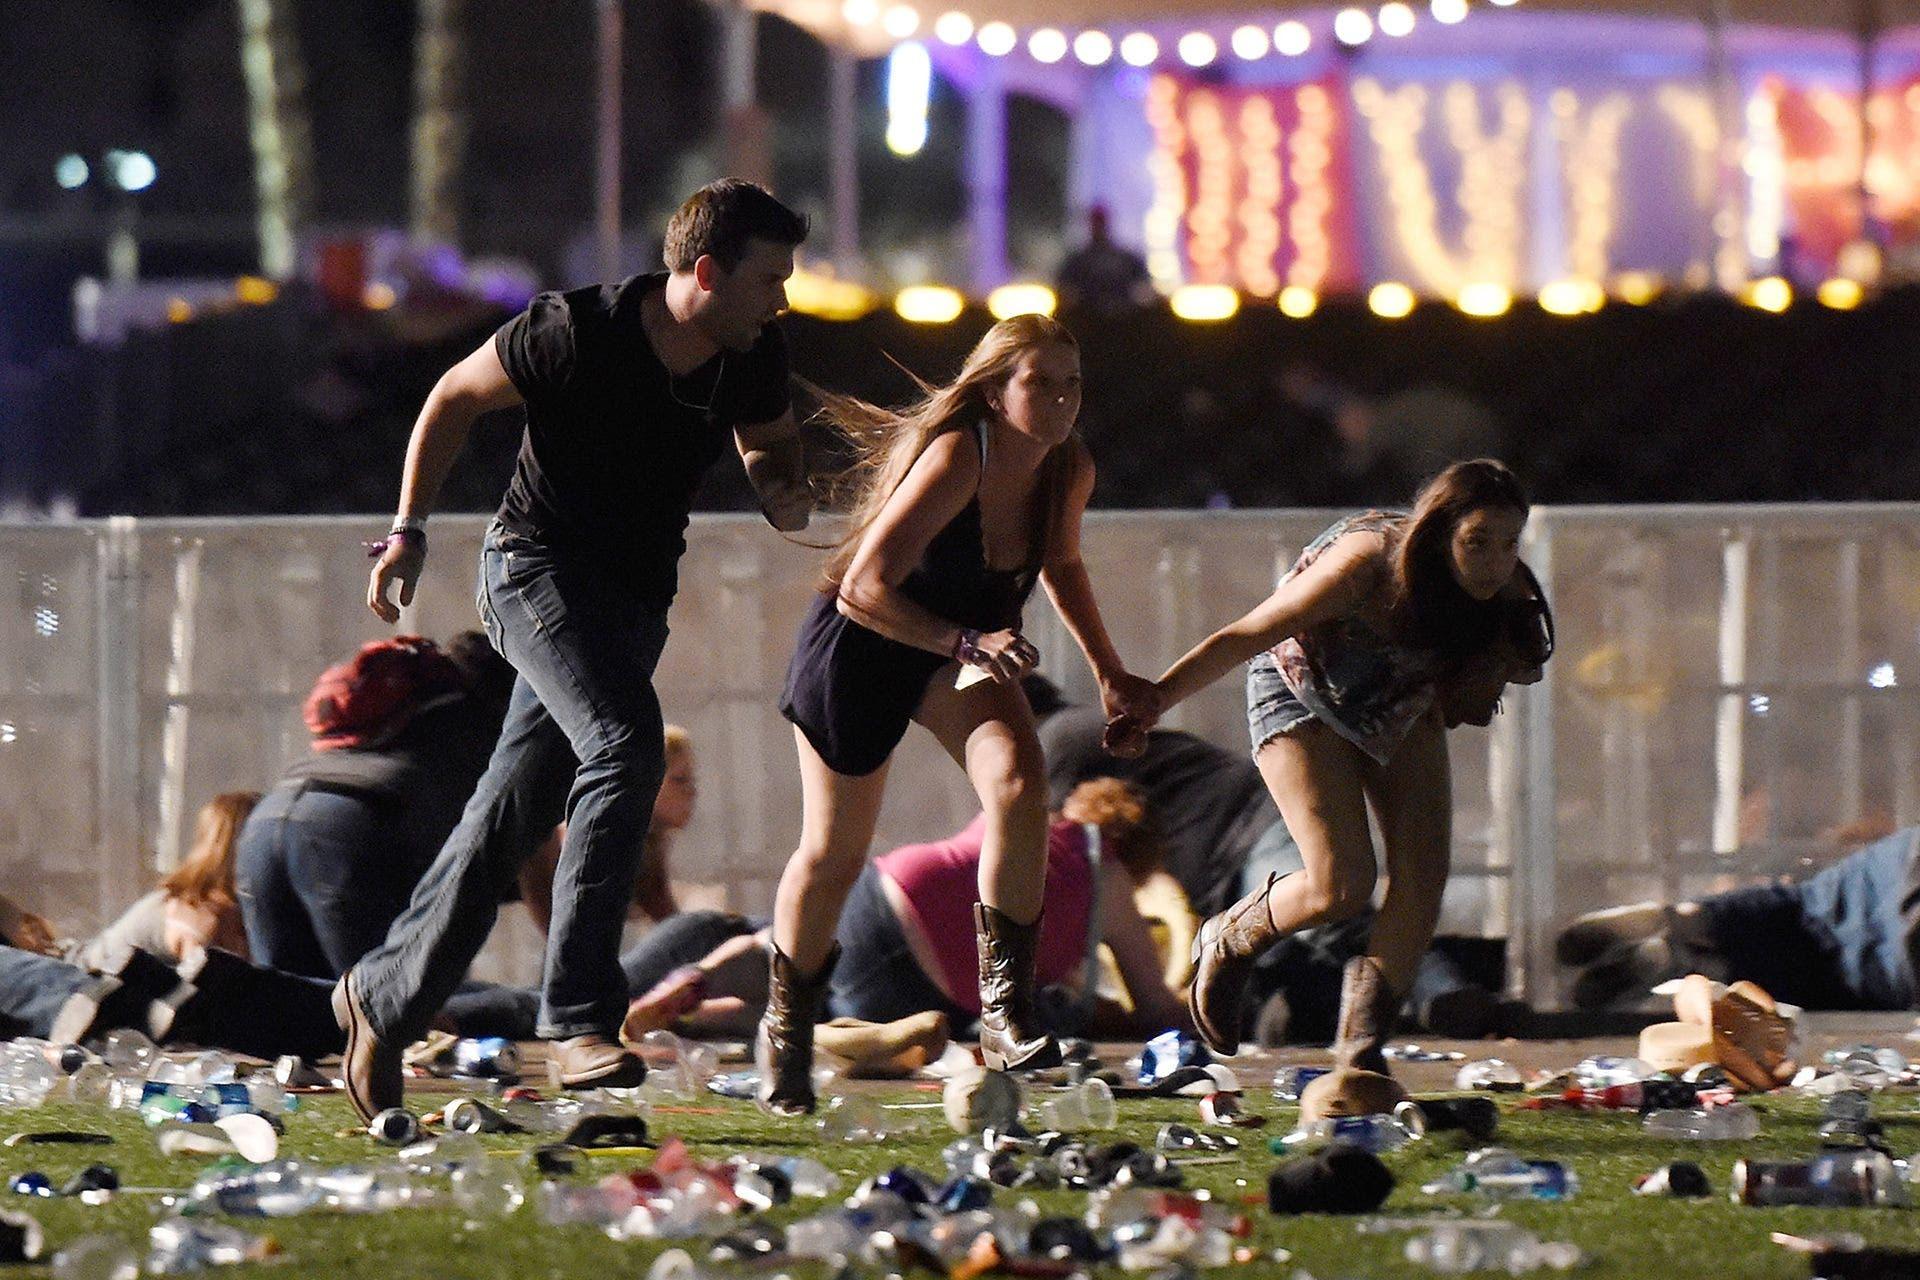 Photos: Las Vegas Shooting